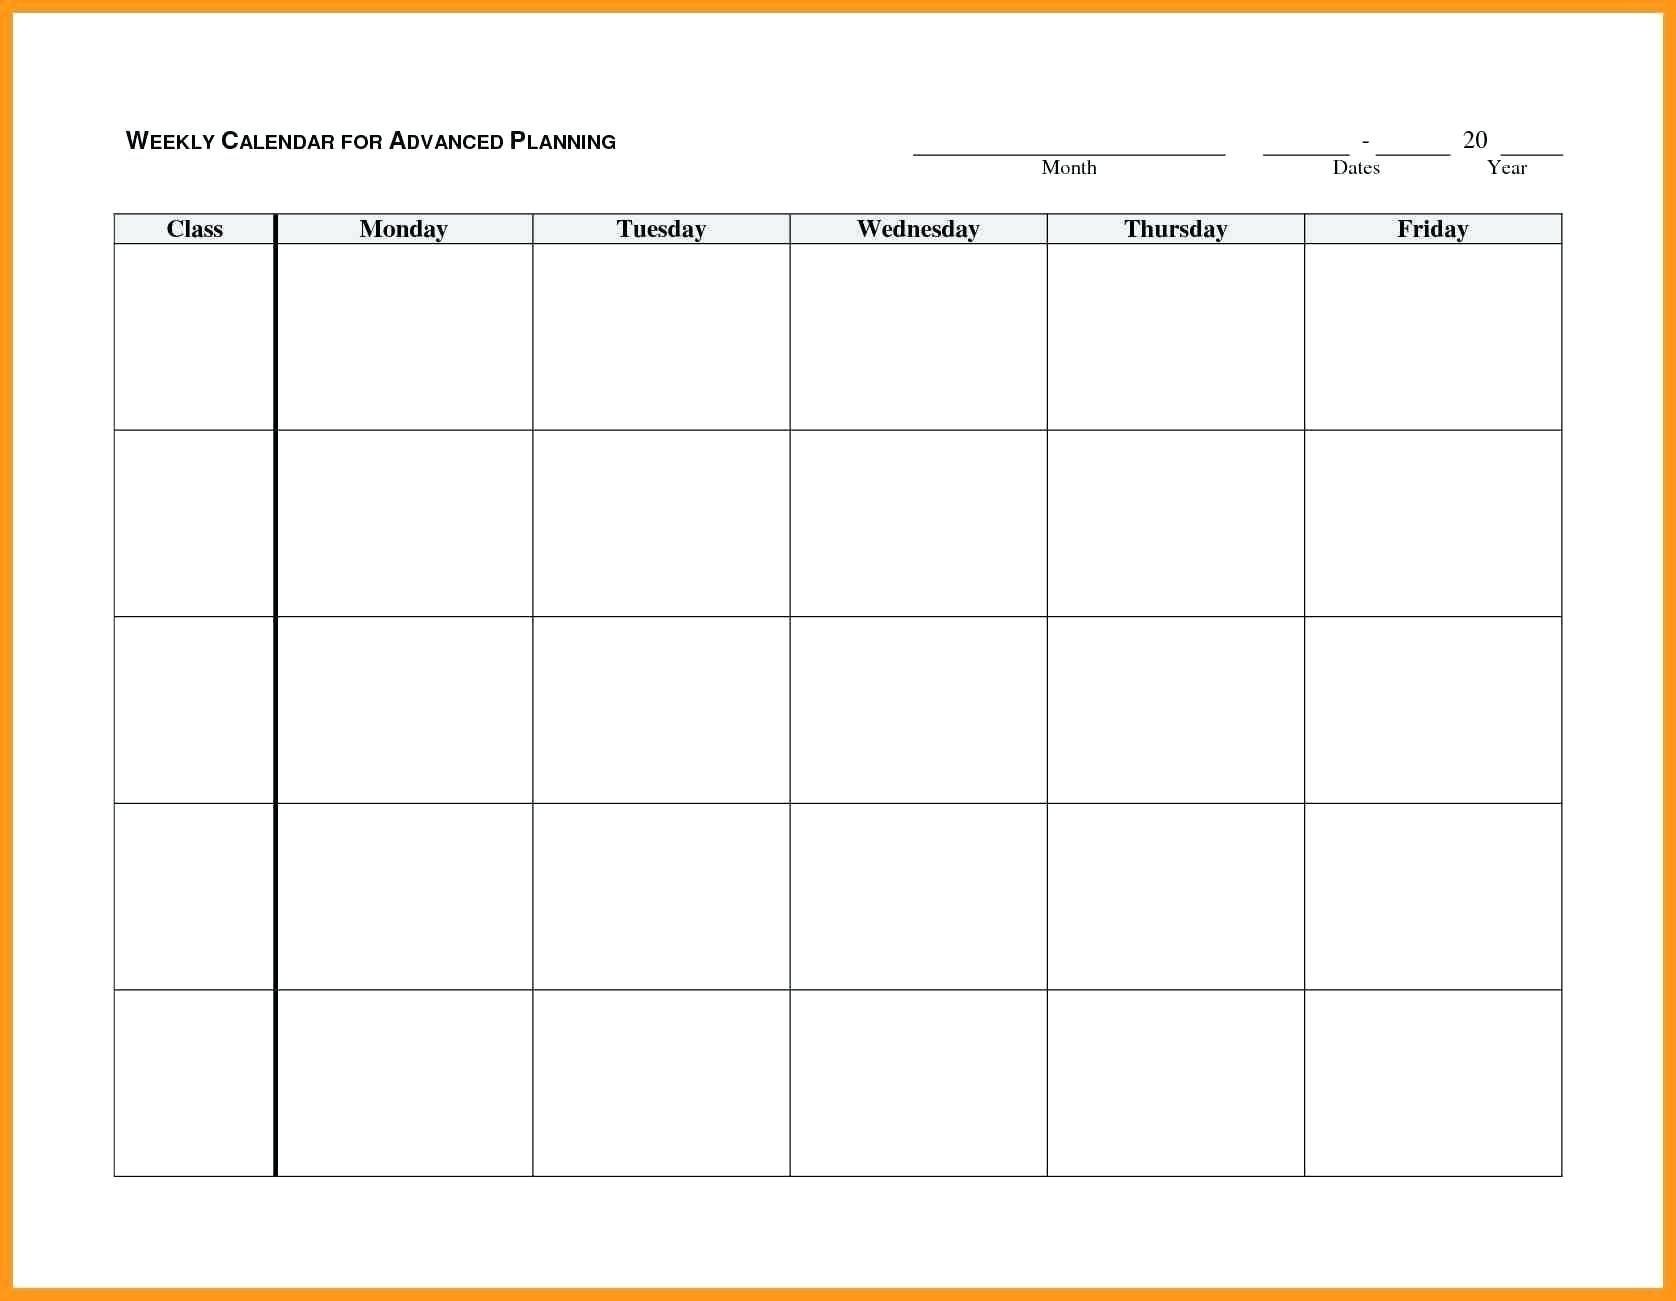 Universal Blank Calendar Grid Moday-Friday – Get Your Blank Calendar Grid Moday-Friday